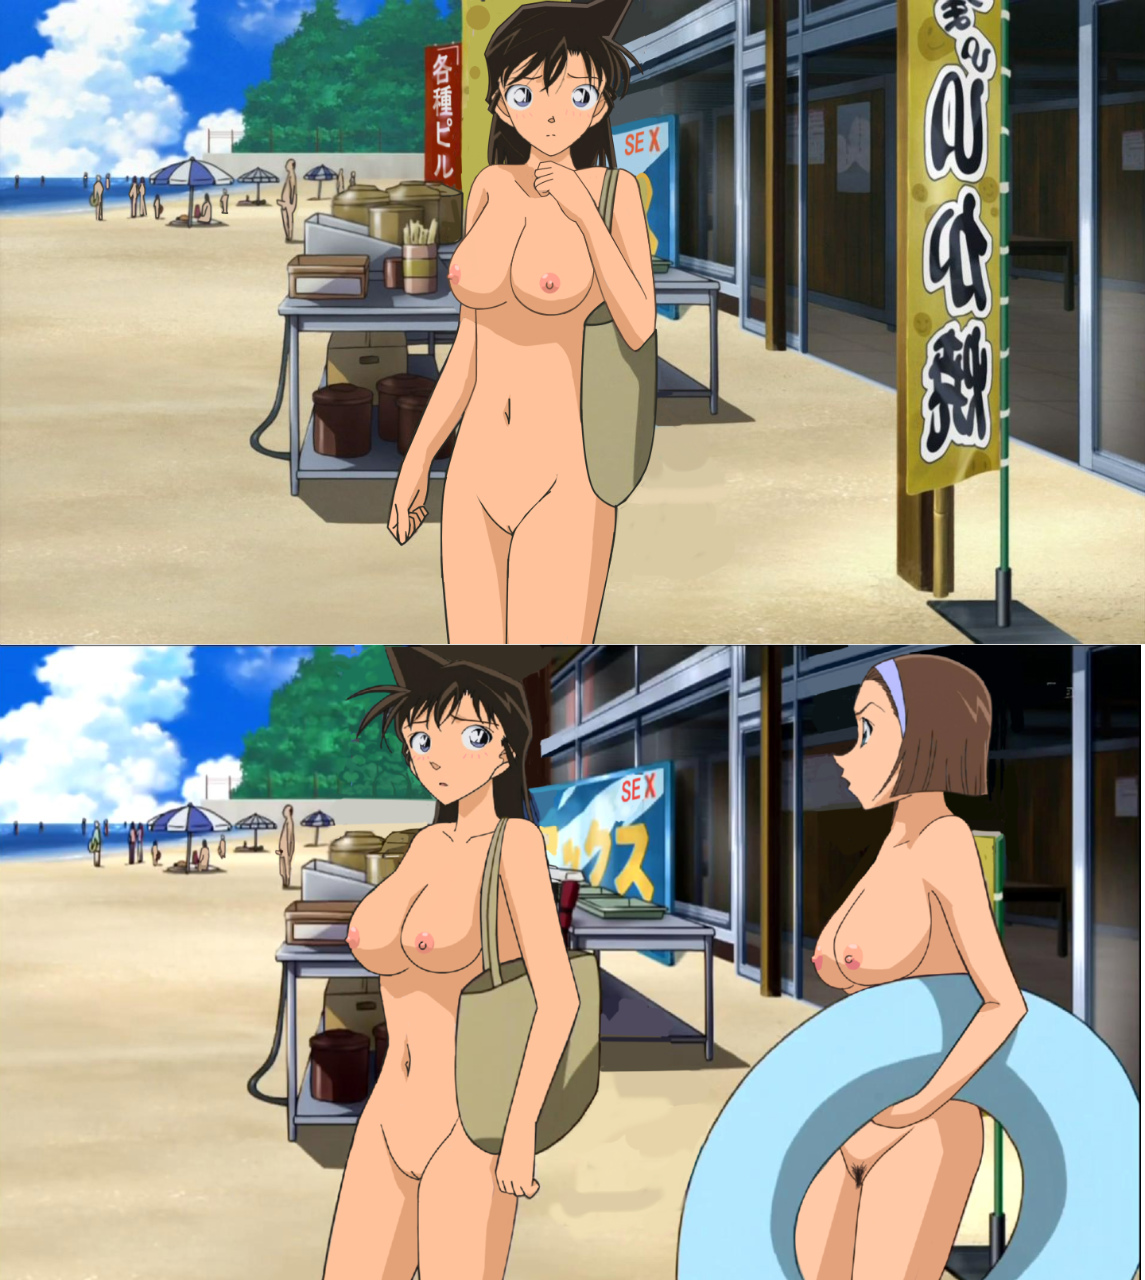 girl-detective-girl-nude-porno-free-naked